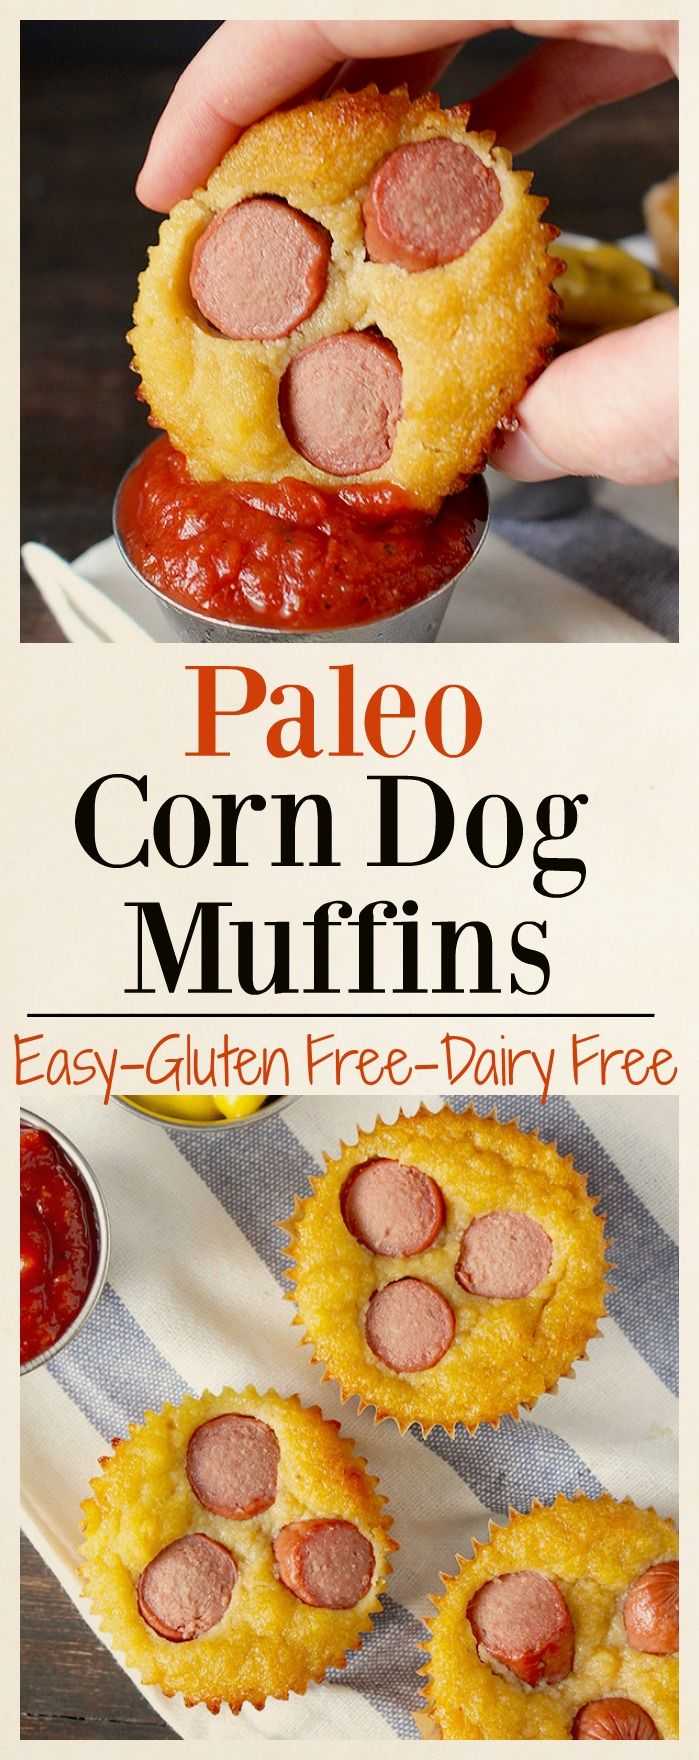 Paleo Corn Dog Muffins- 5 uncured hotdogs (Applegate); 1/2 cup almond flour; 1/2 cup coconut flour; 2 tablespoons ghee, melted; 2 tablespoons coconut oil, melted; 2 tablespoons honey; 1/2 cup cashew milk, or other non-dairy milk; 3 eggs; ¼ teaspoon salt; 1/2 teaspoon baking soda